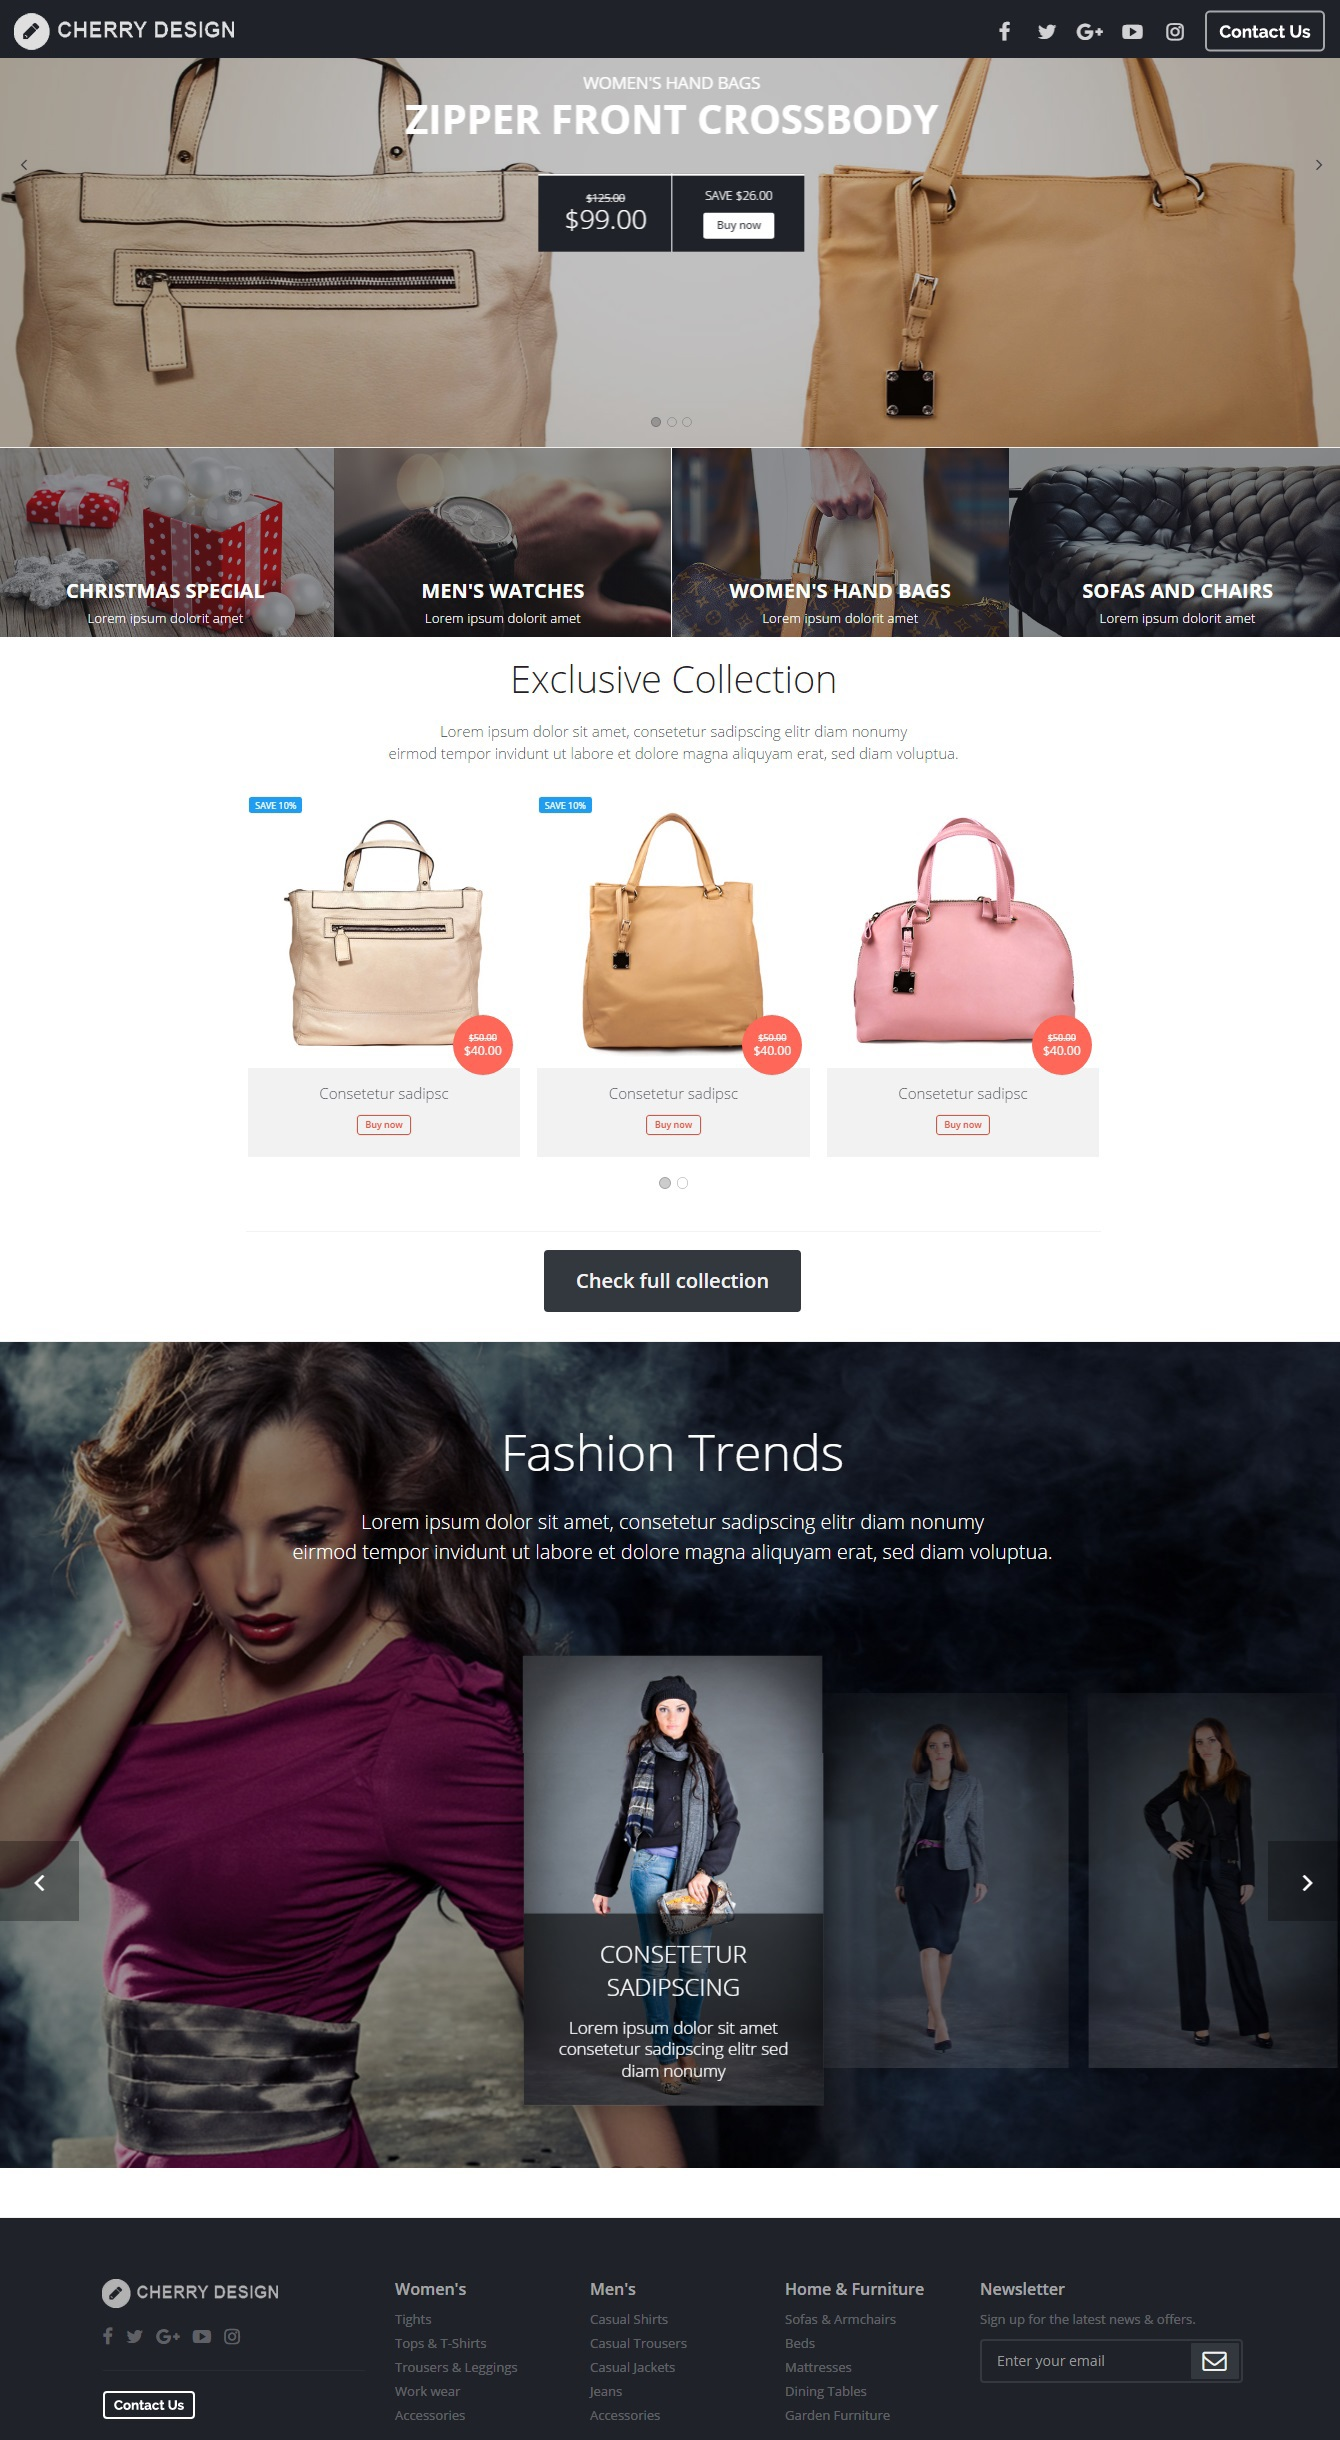 OnlineStore-CherryDesign-CherryAdv